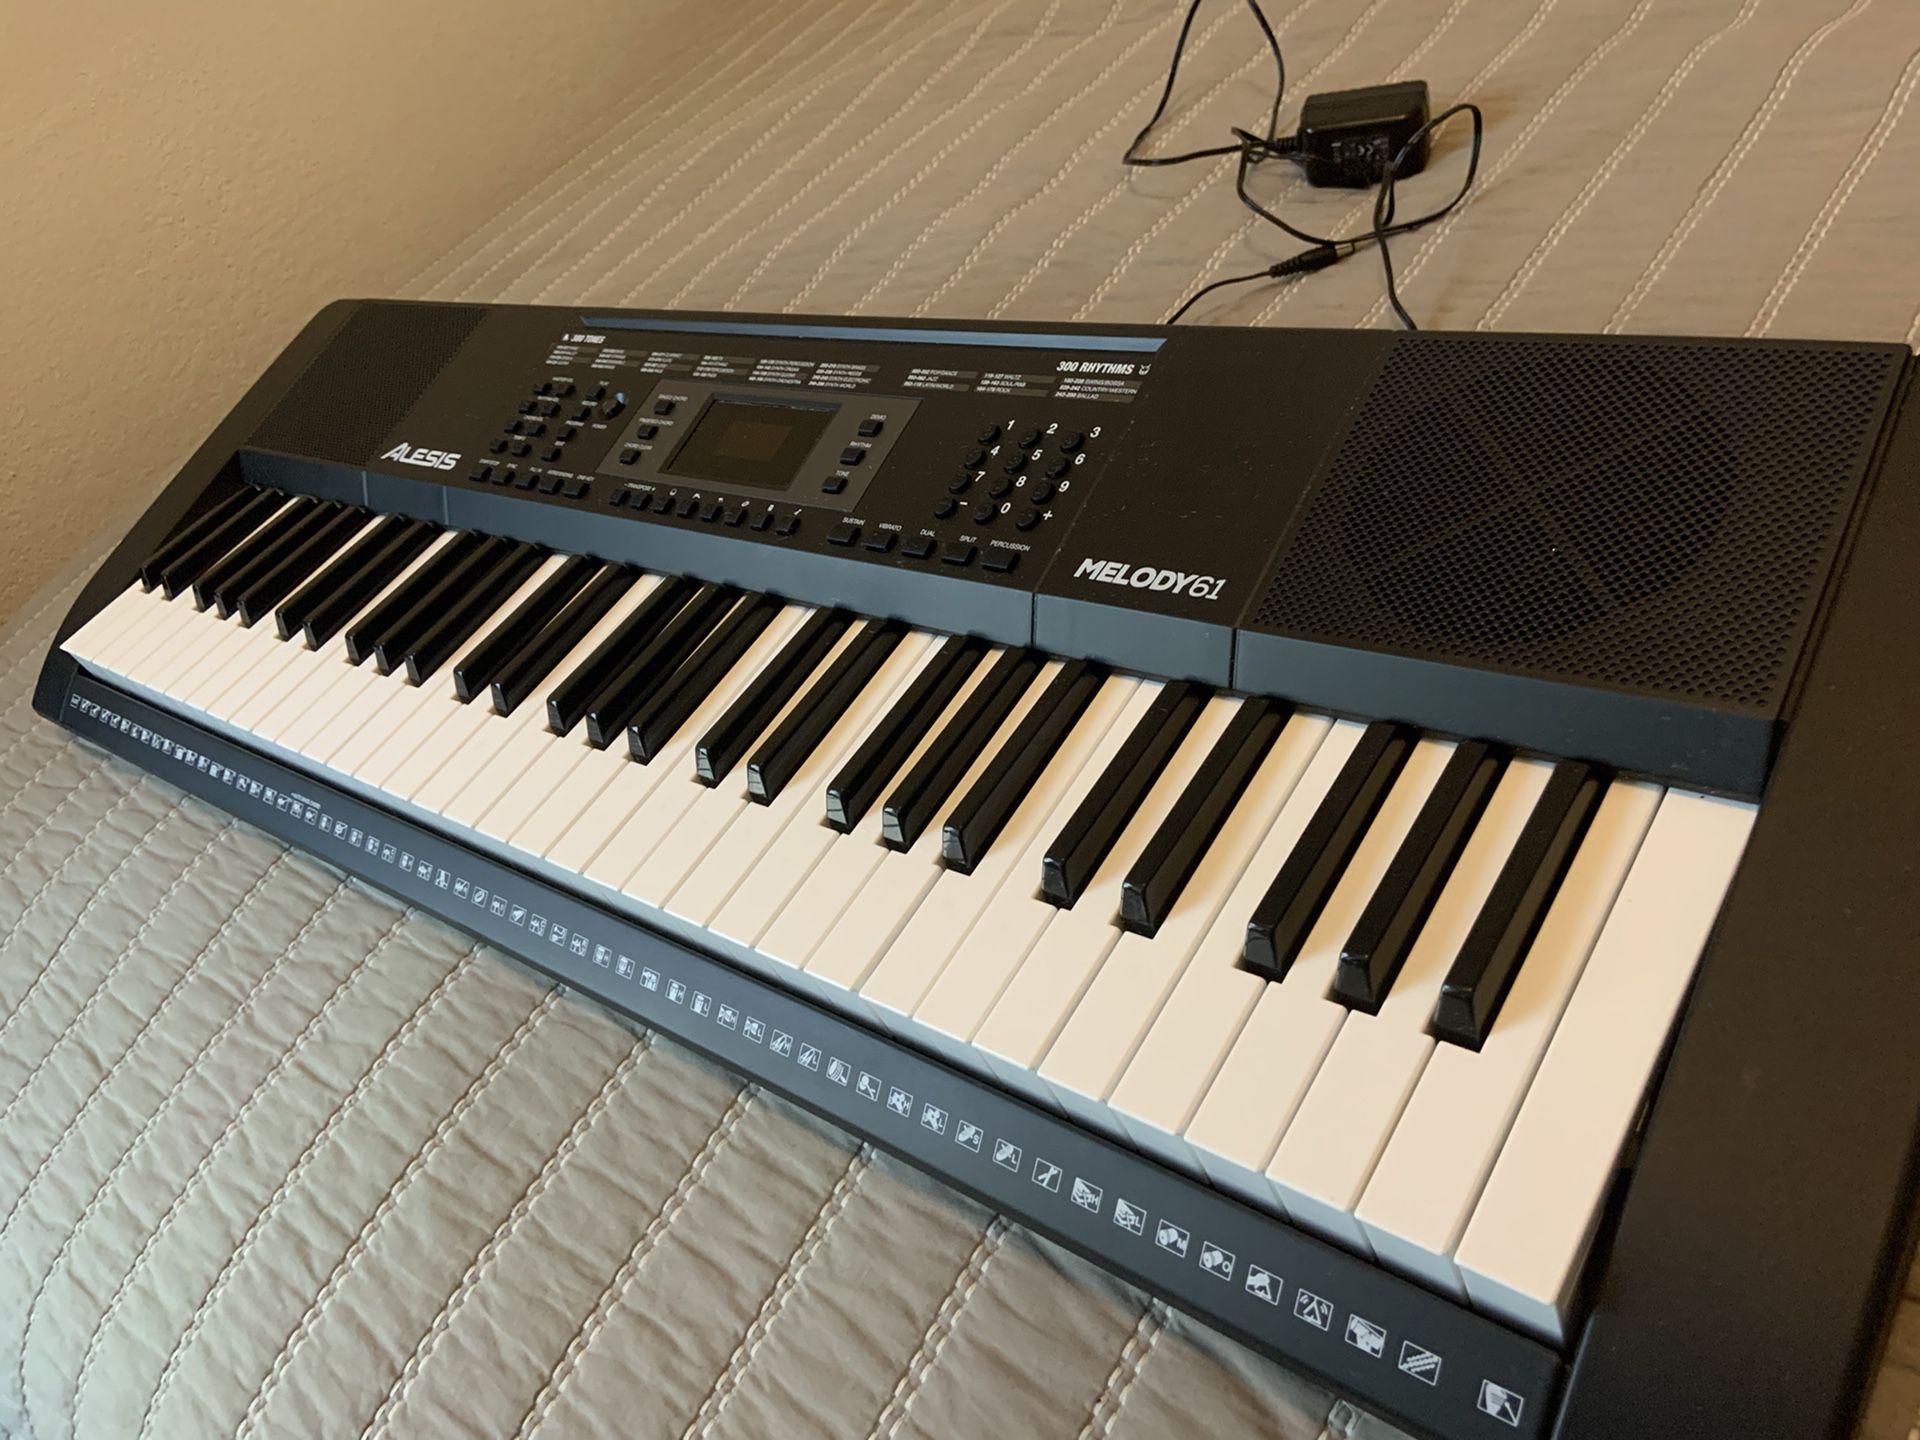 ALESIS Musical Keyboard